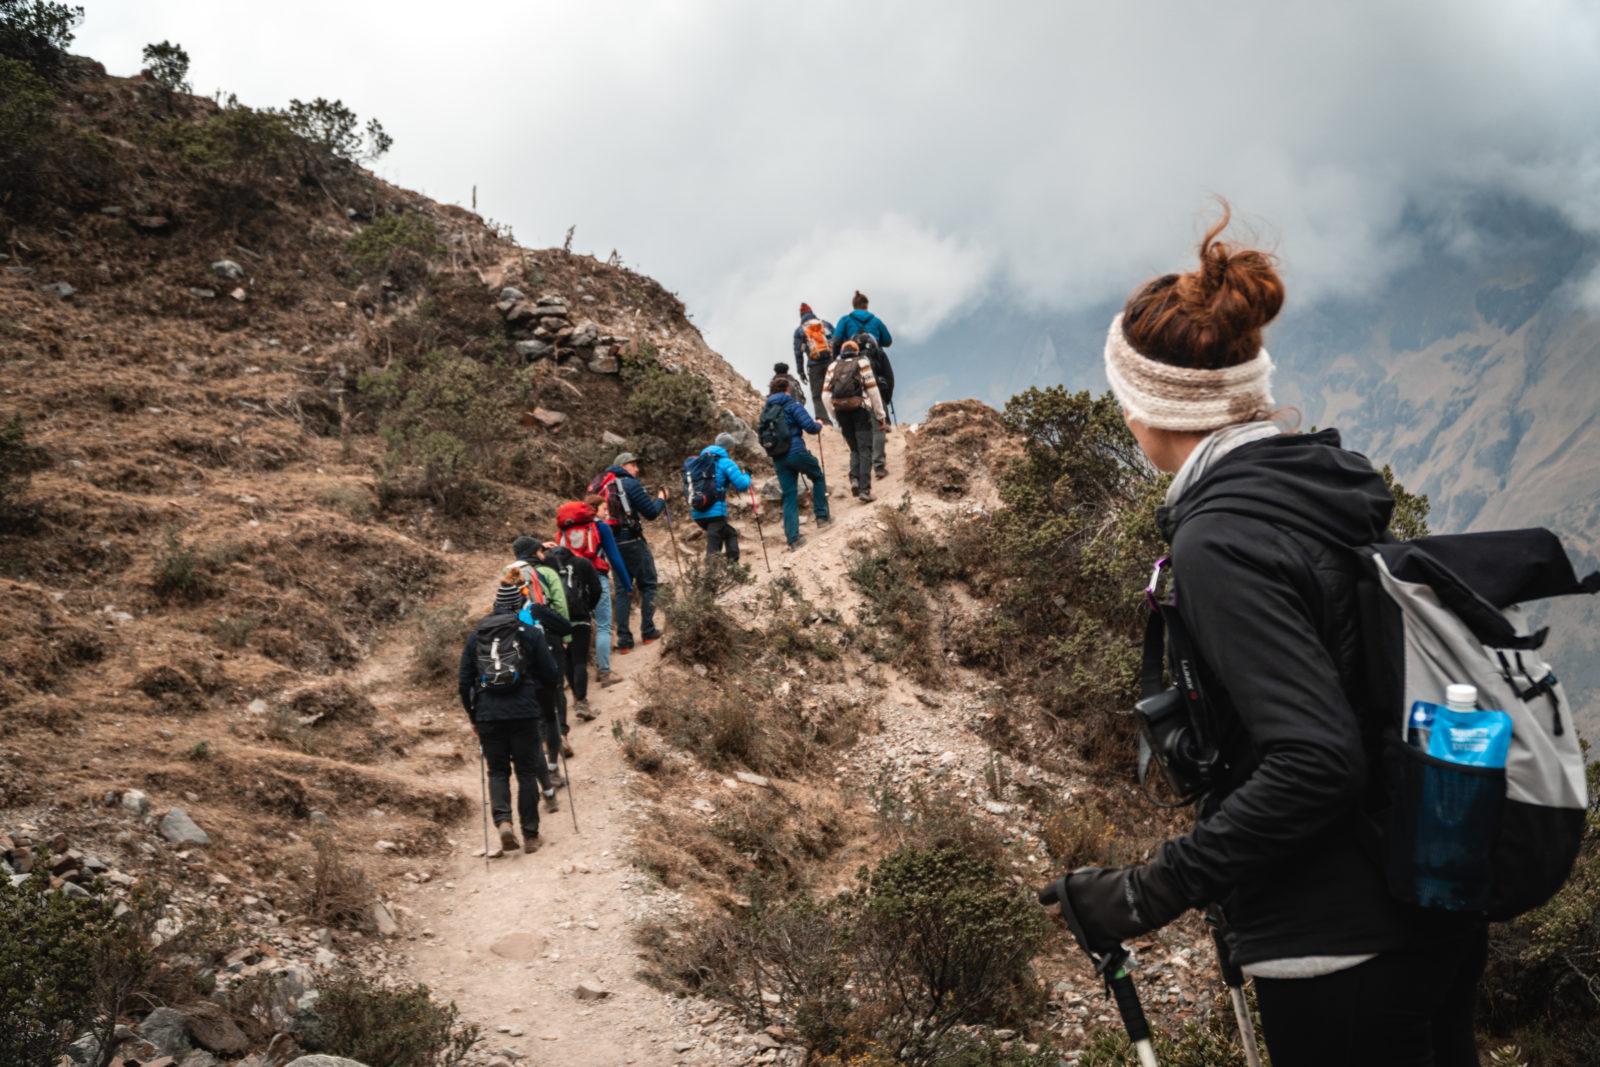 Wanderung auf dem Salkantay Trek